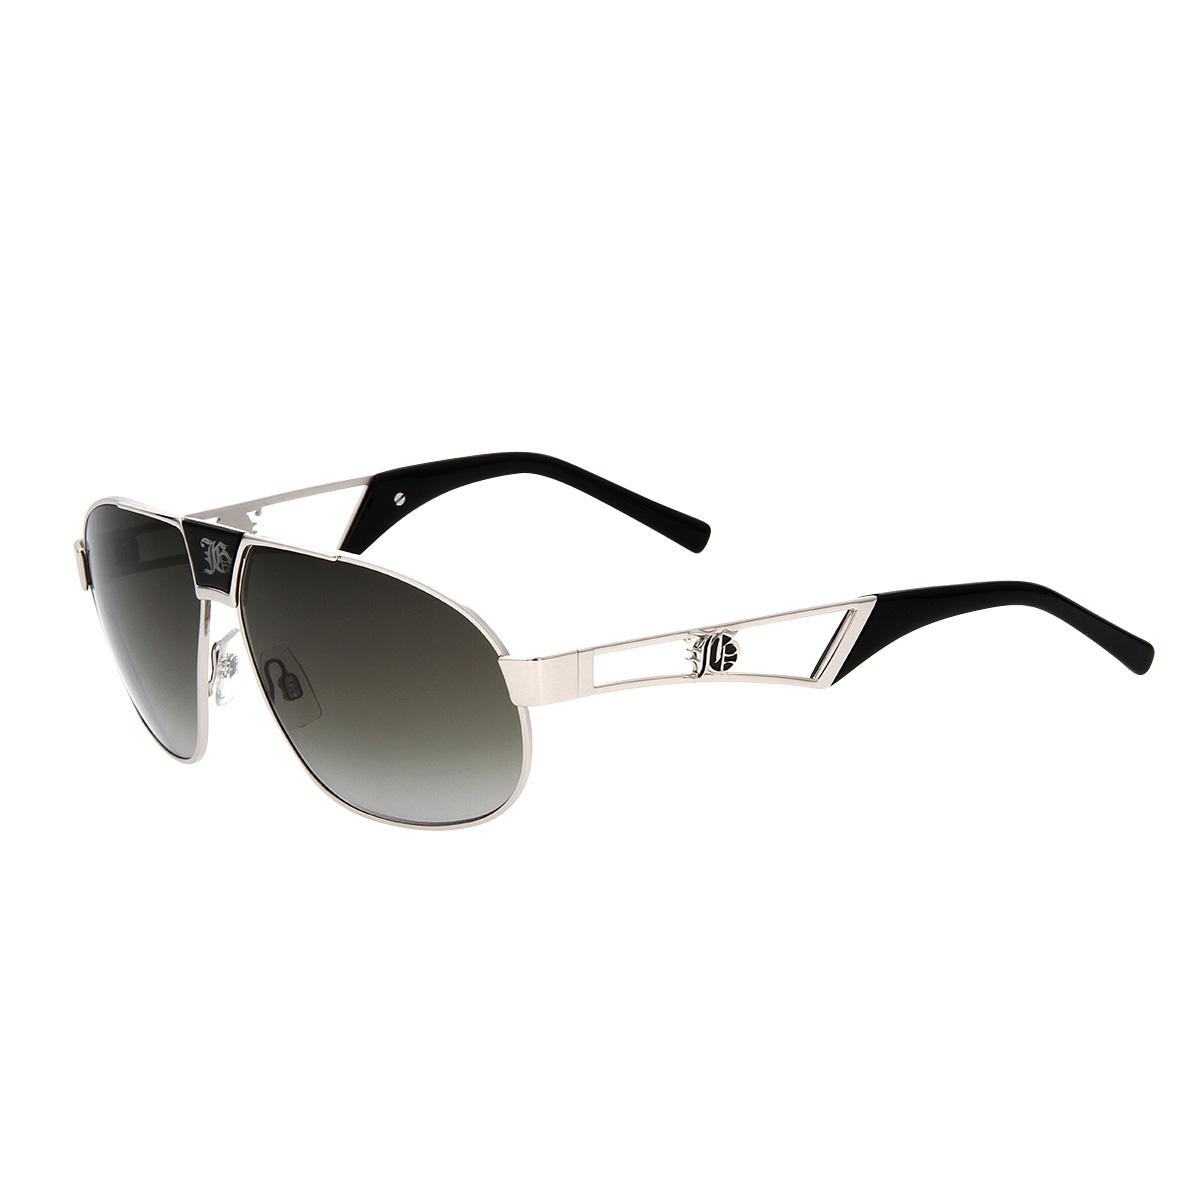 john galliano cool mens metal sunglasses jg0051 16b silver